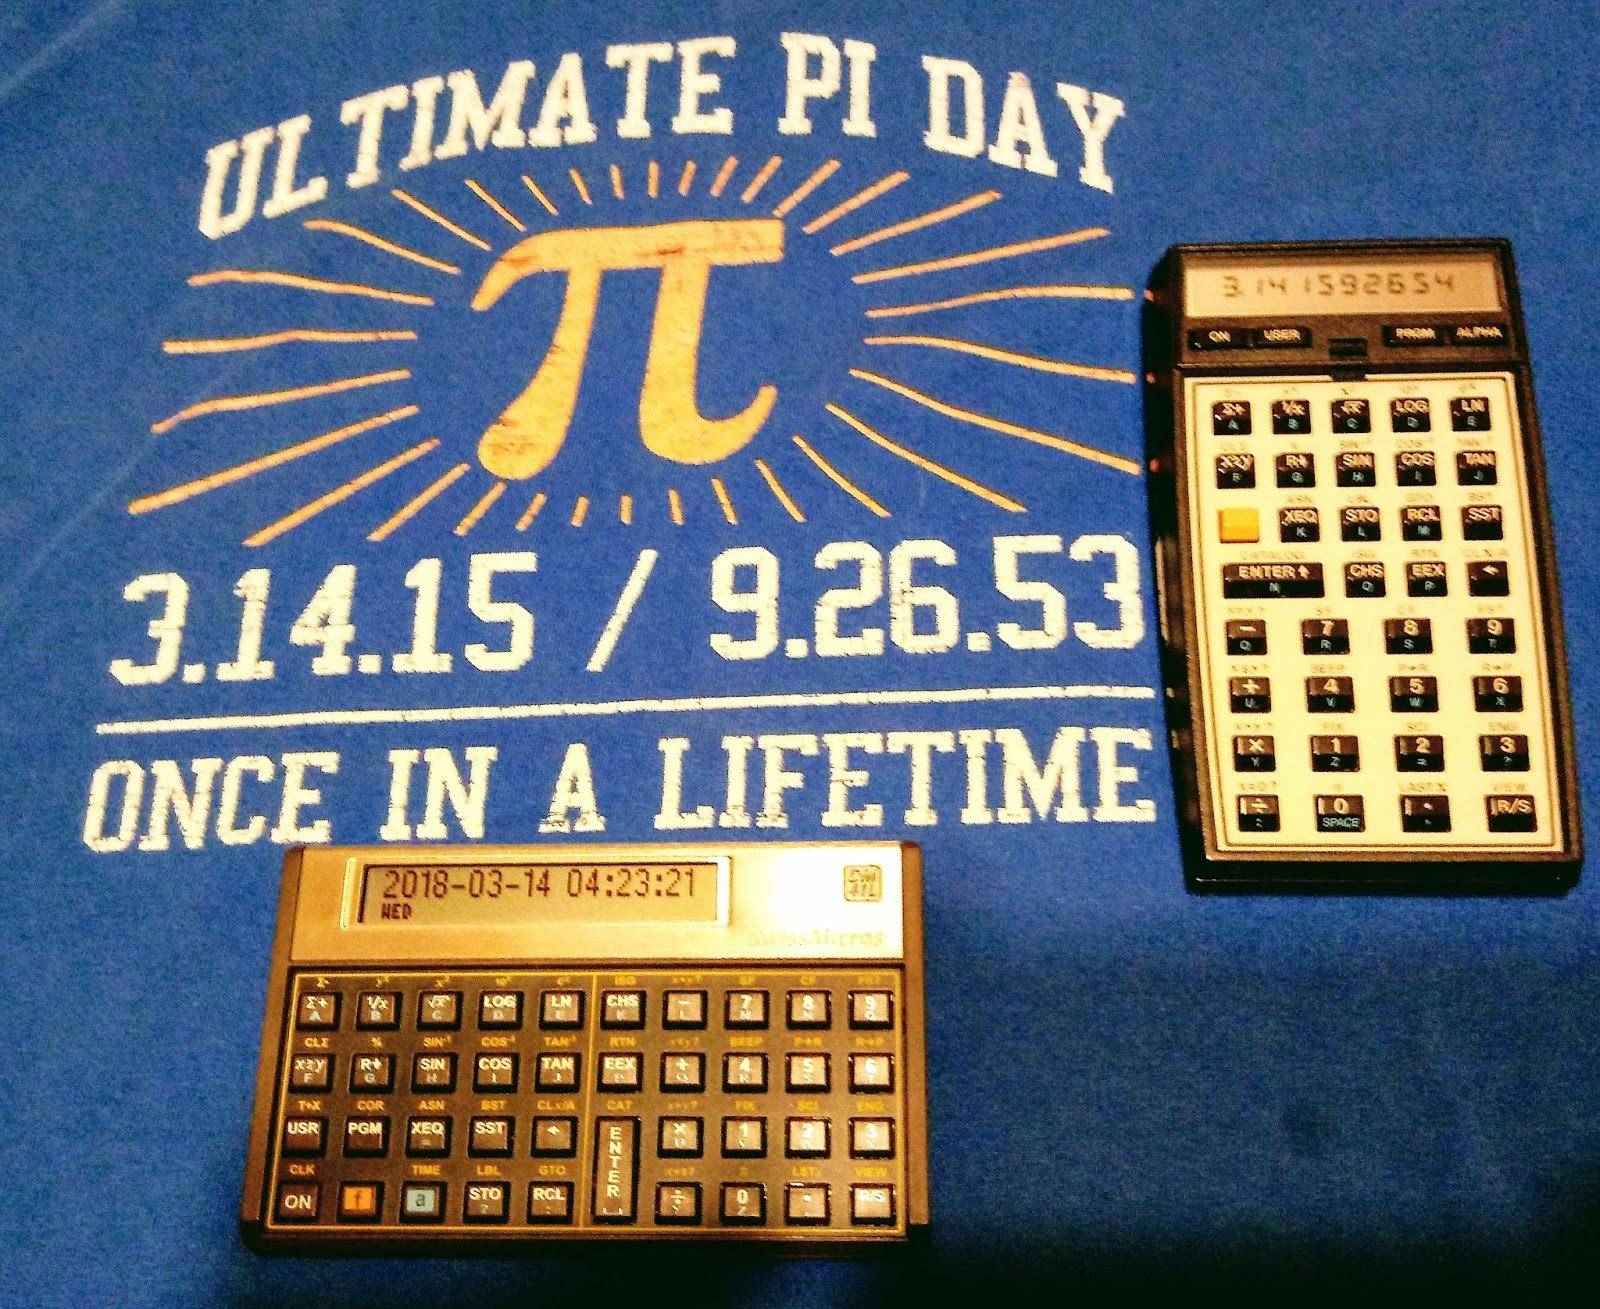 eddie s math and calculator blog pi day 2018